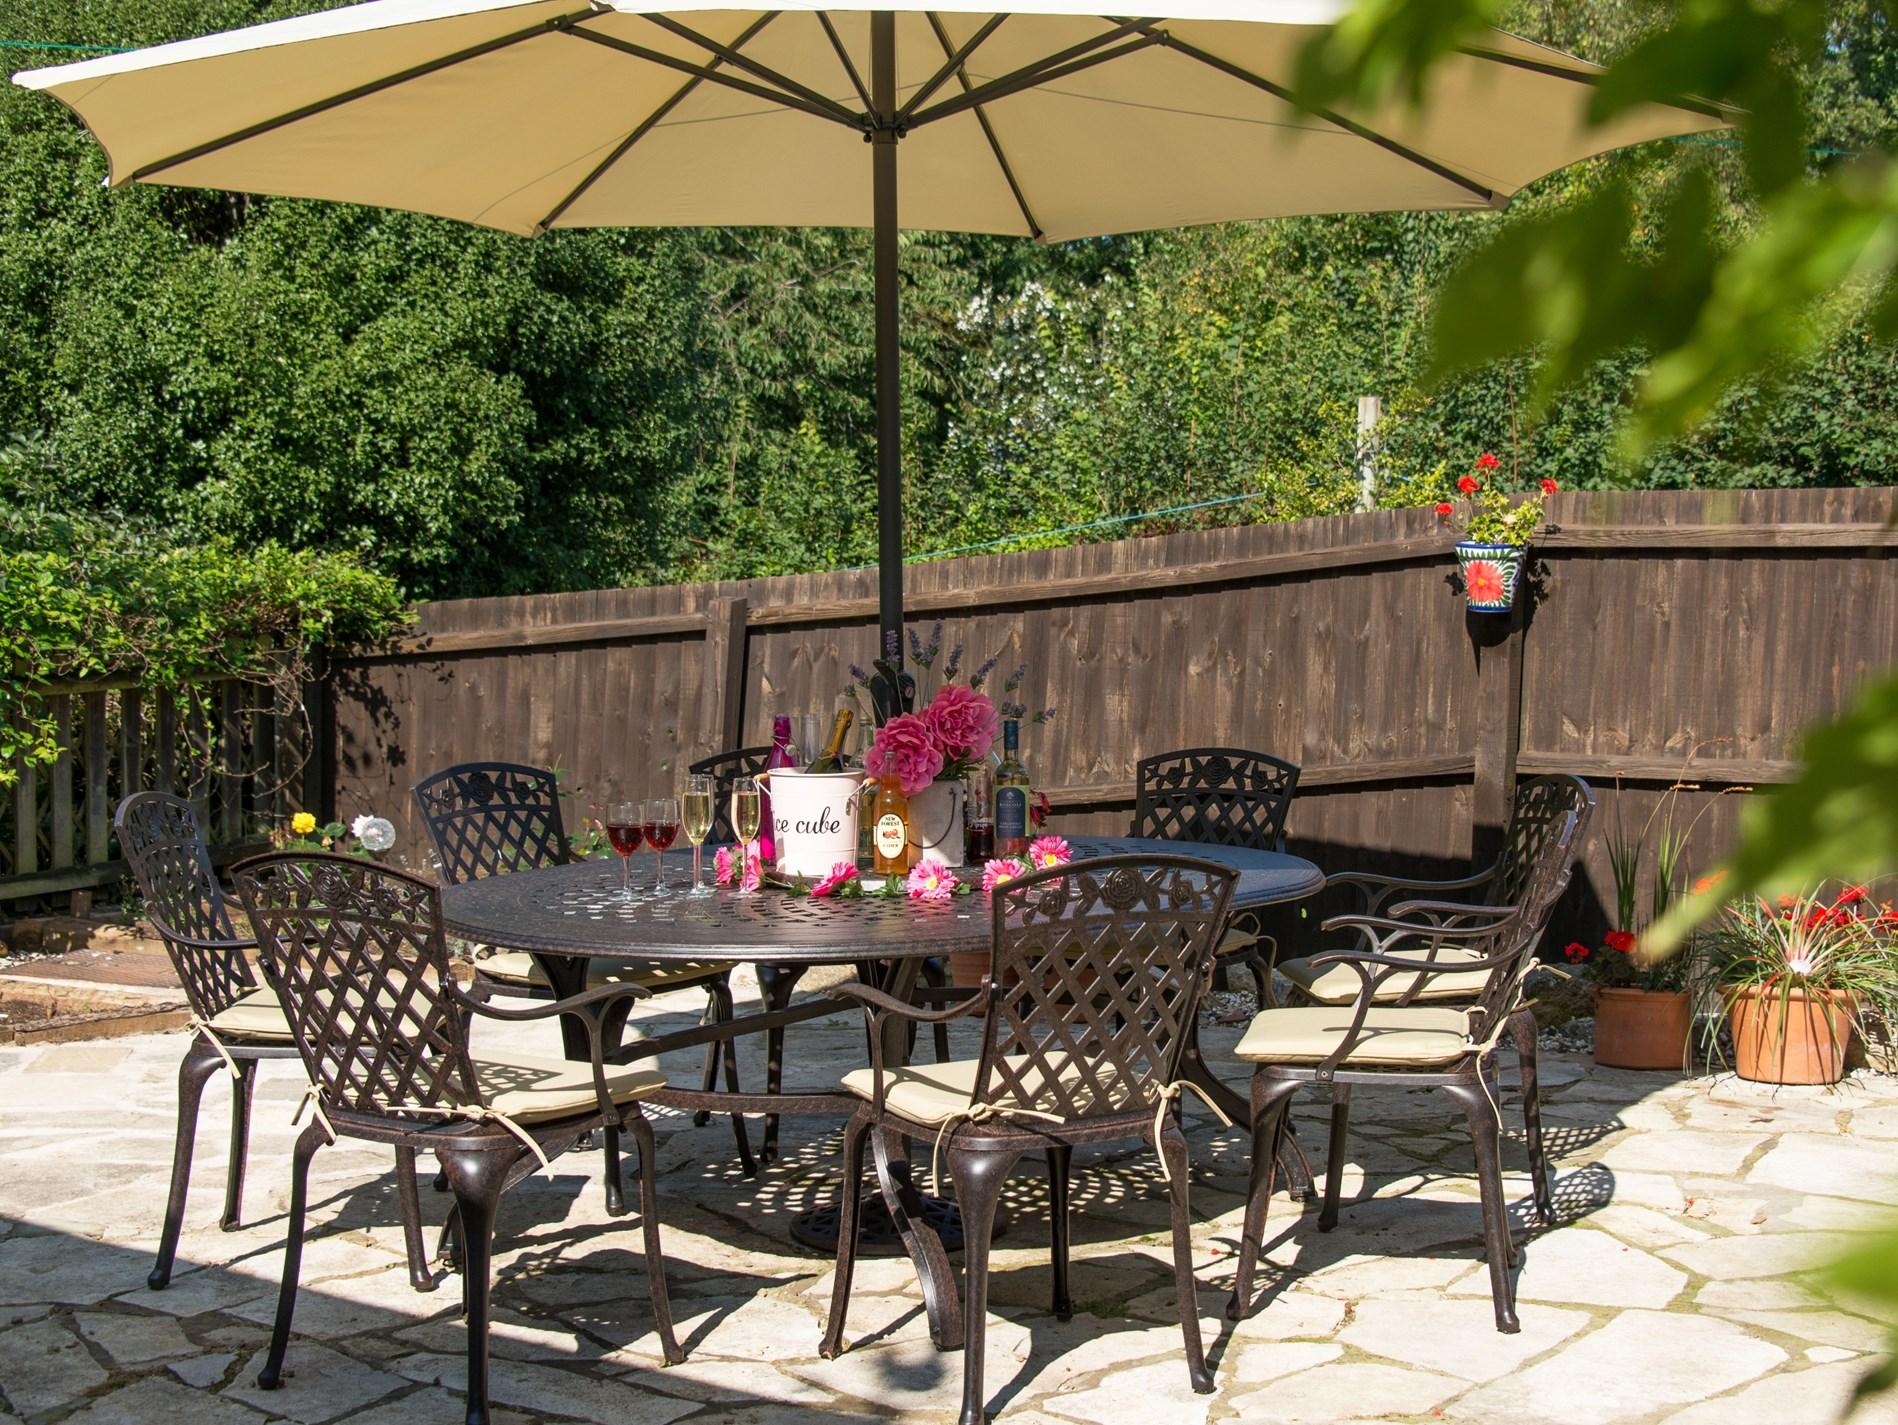 Enjoy the sunny terrace